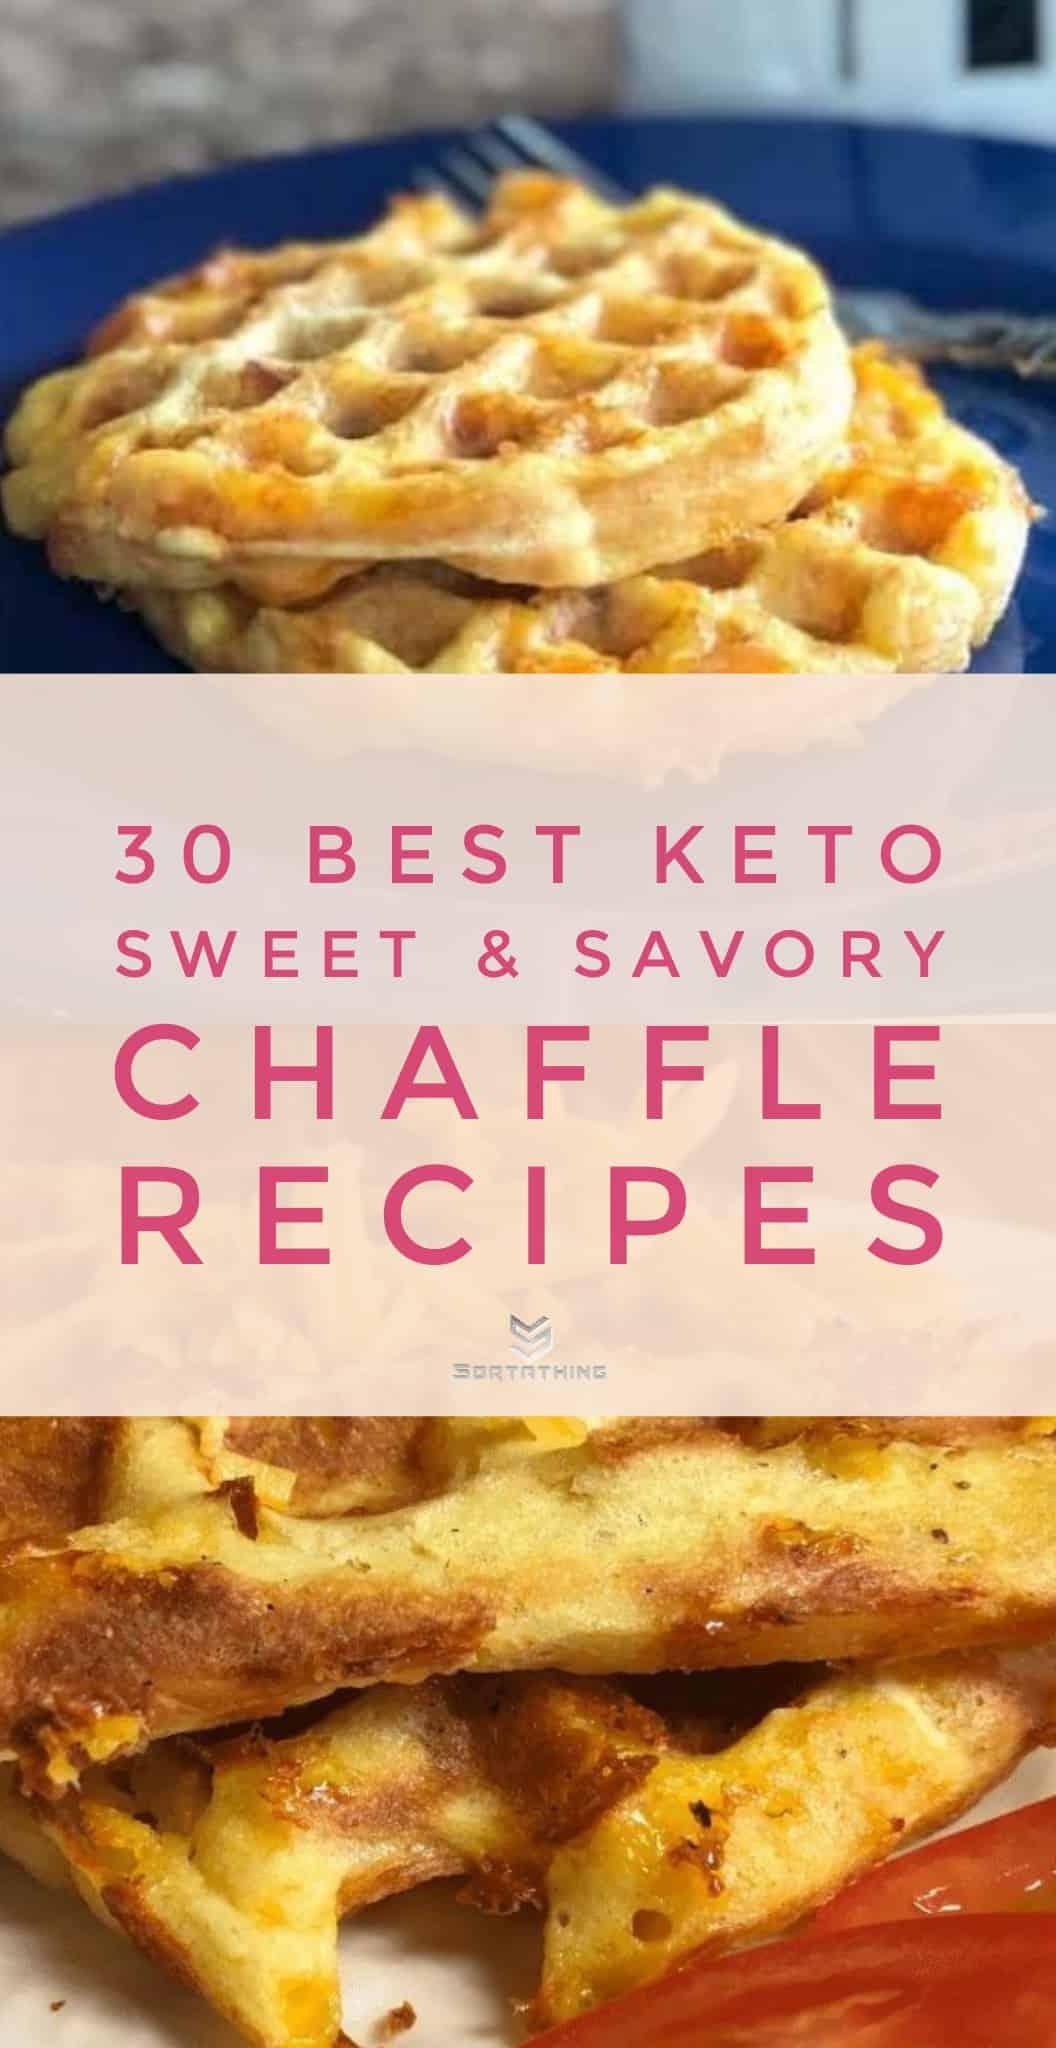 Keto Bacon, Egg & Cheese Chaffles and Jalapeno & Cheddar Chaffles